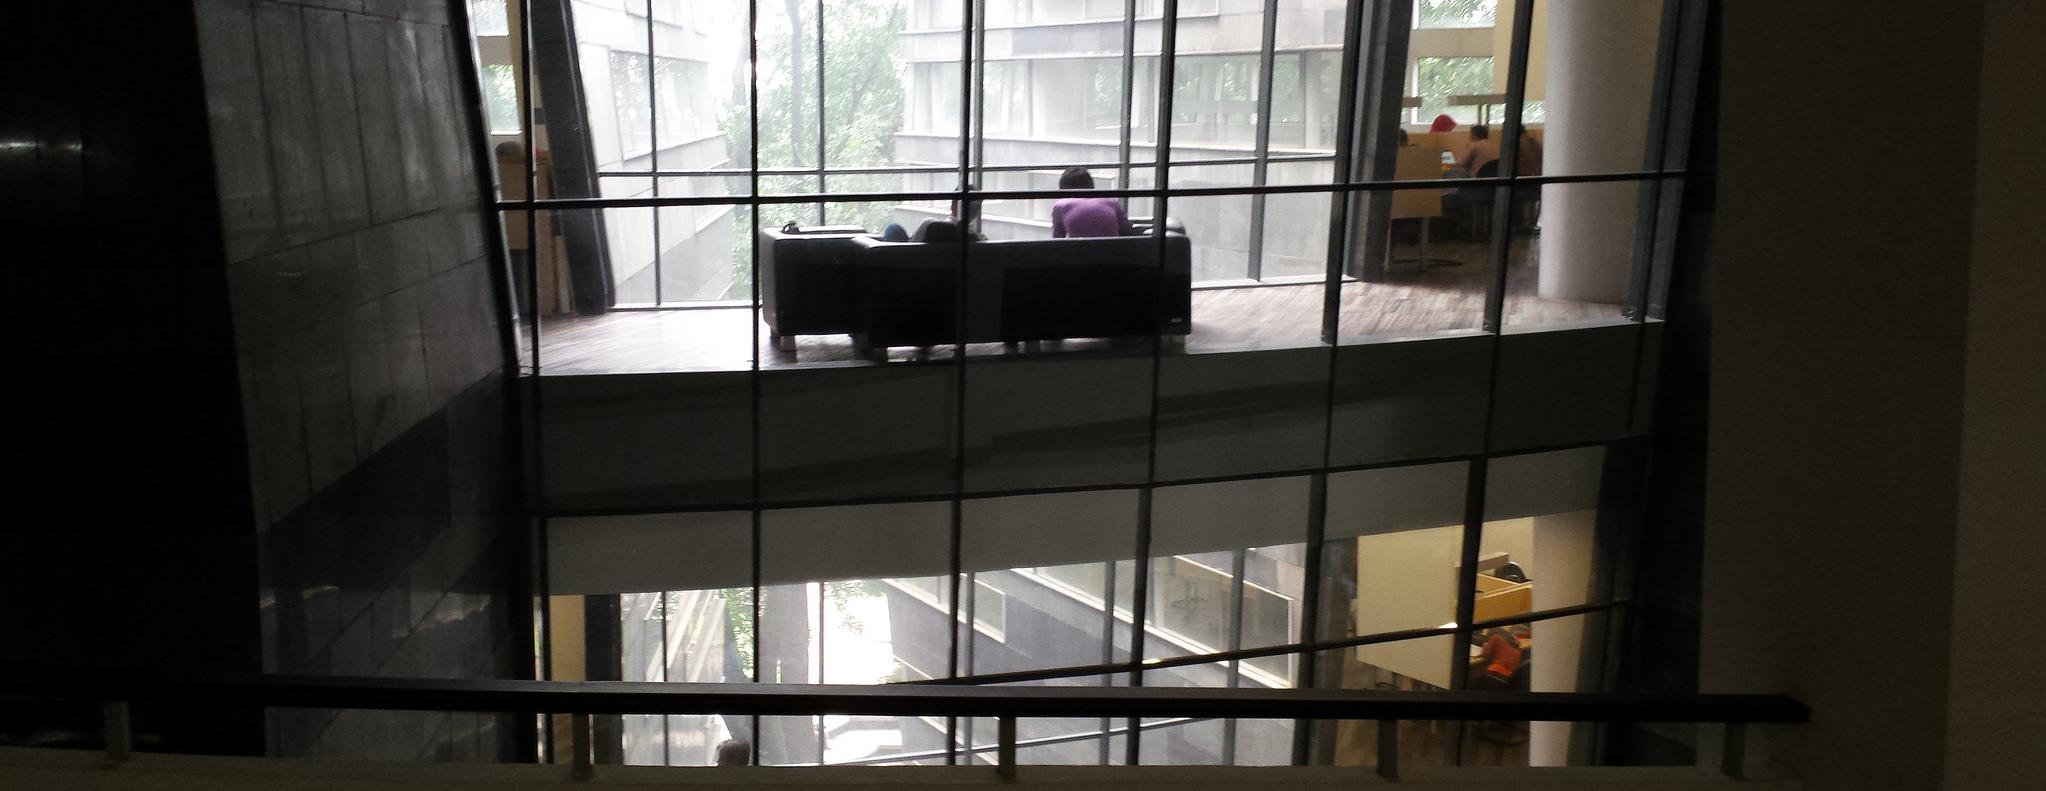 University Indonesia, Jakarta (Photo: Ruth San/Flickr)